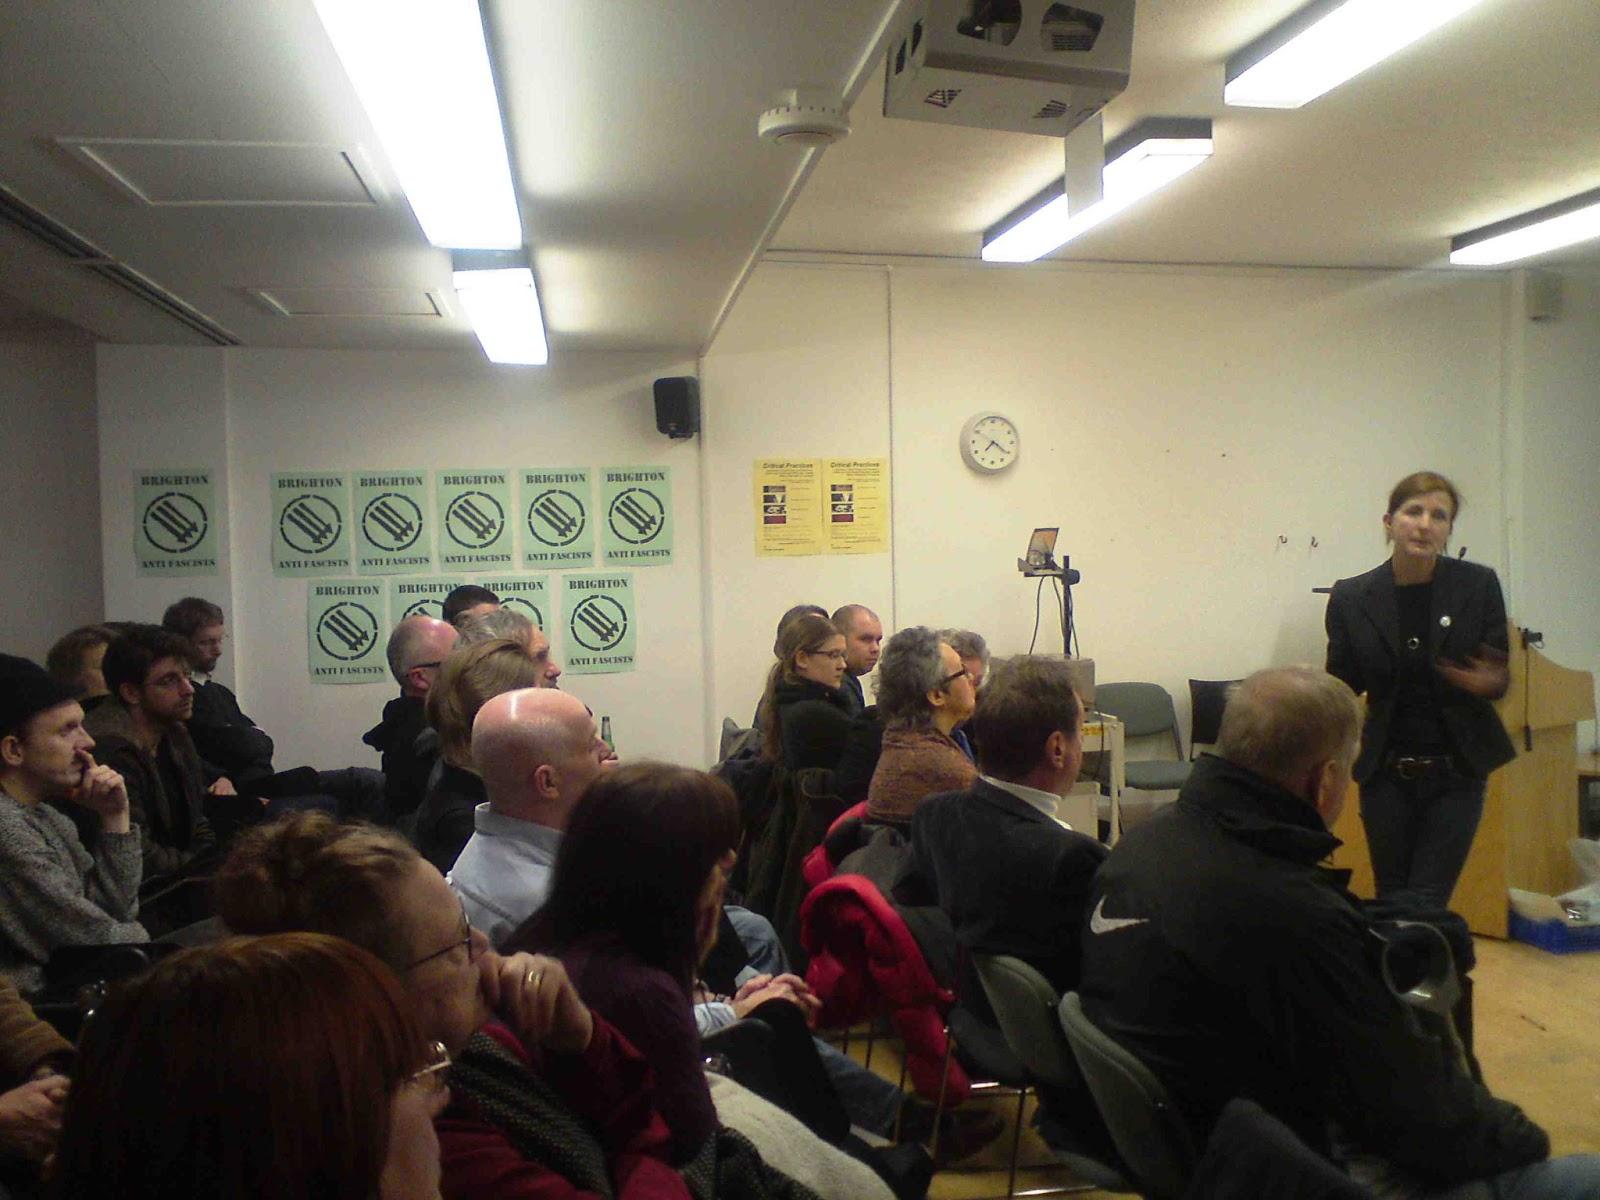 Tony Greenstein Blog: Tony Greenstein's Blog: Anti-Fascist Book Launch In